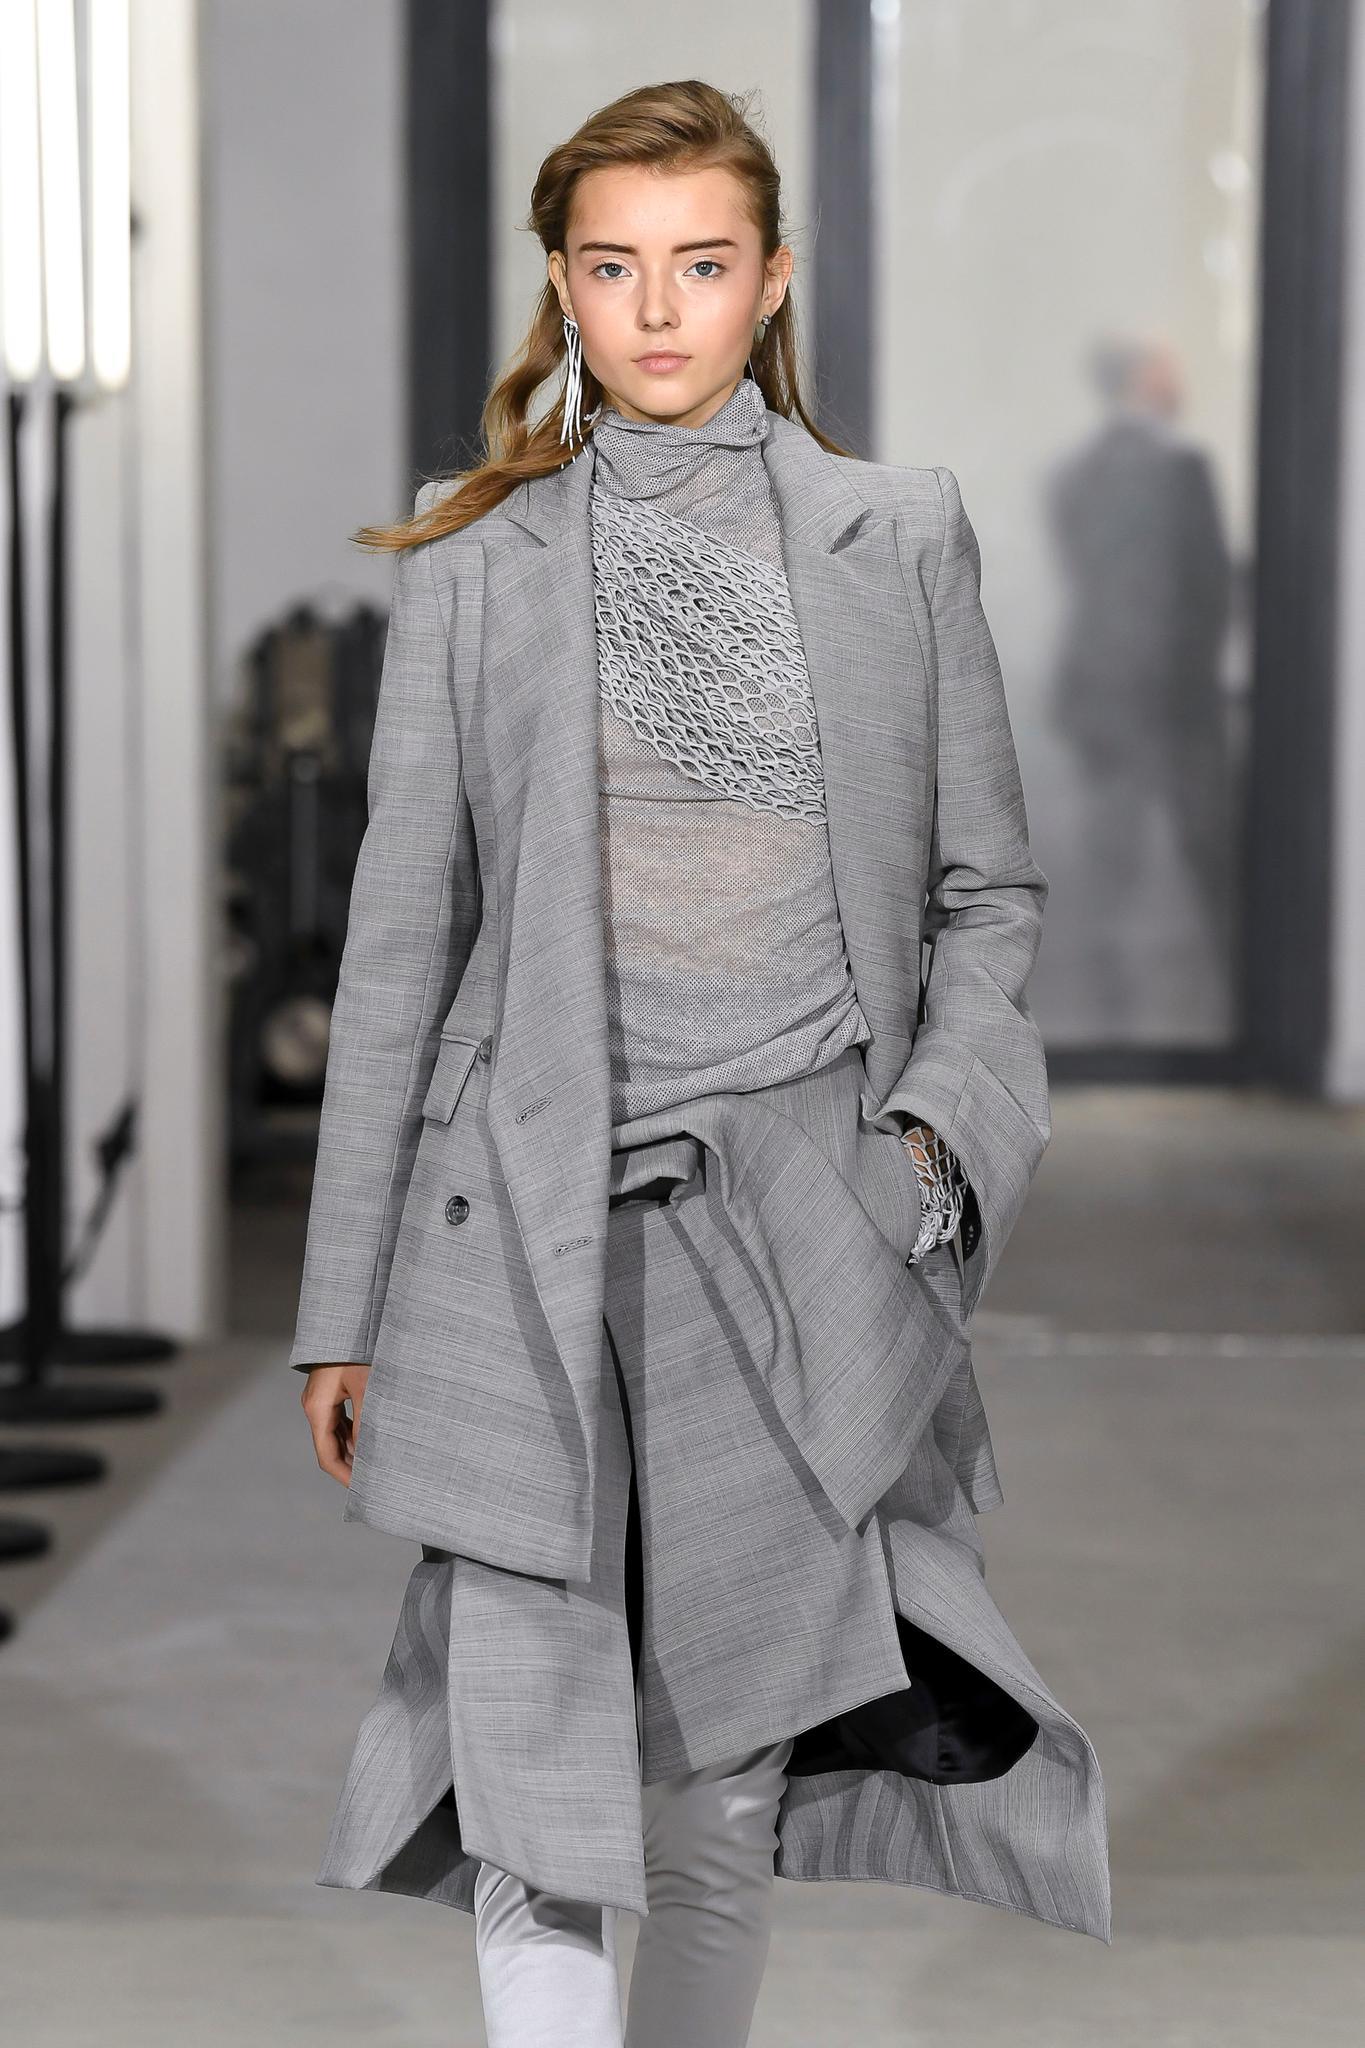 Modell trägt Hosenrock bei Maticevski